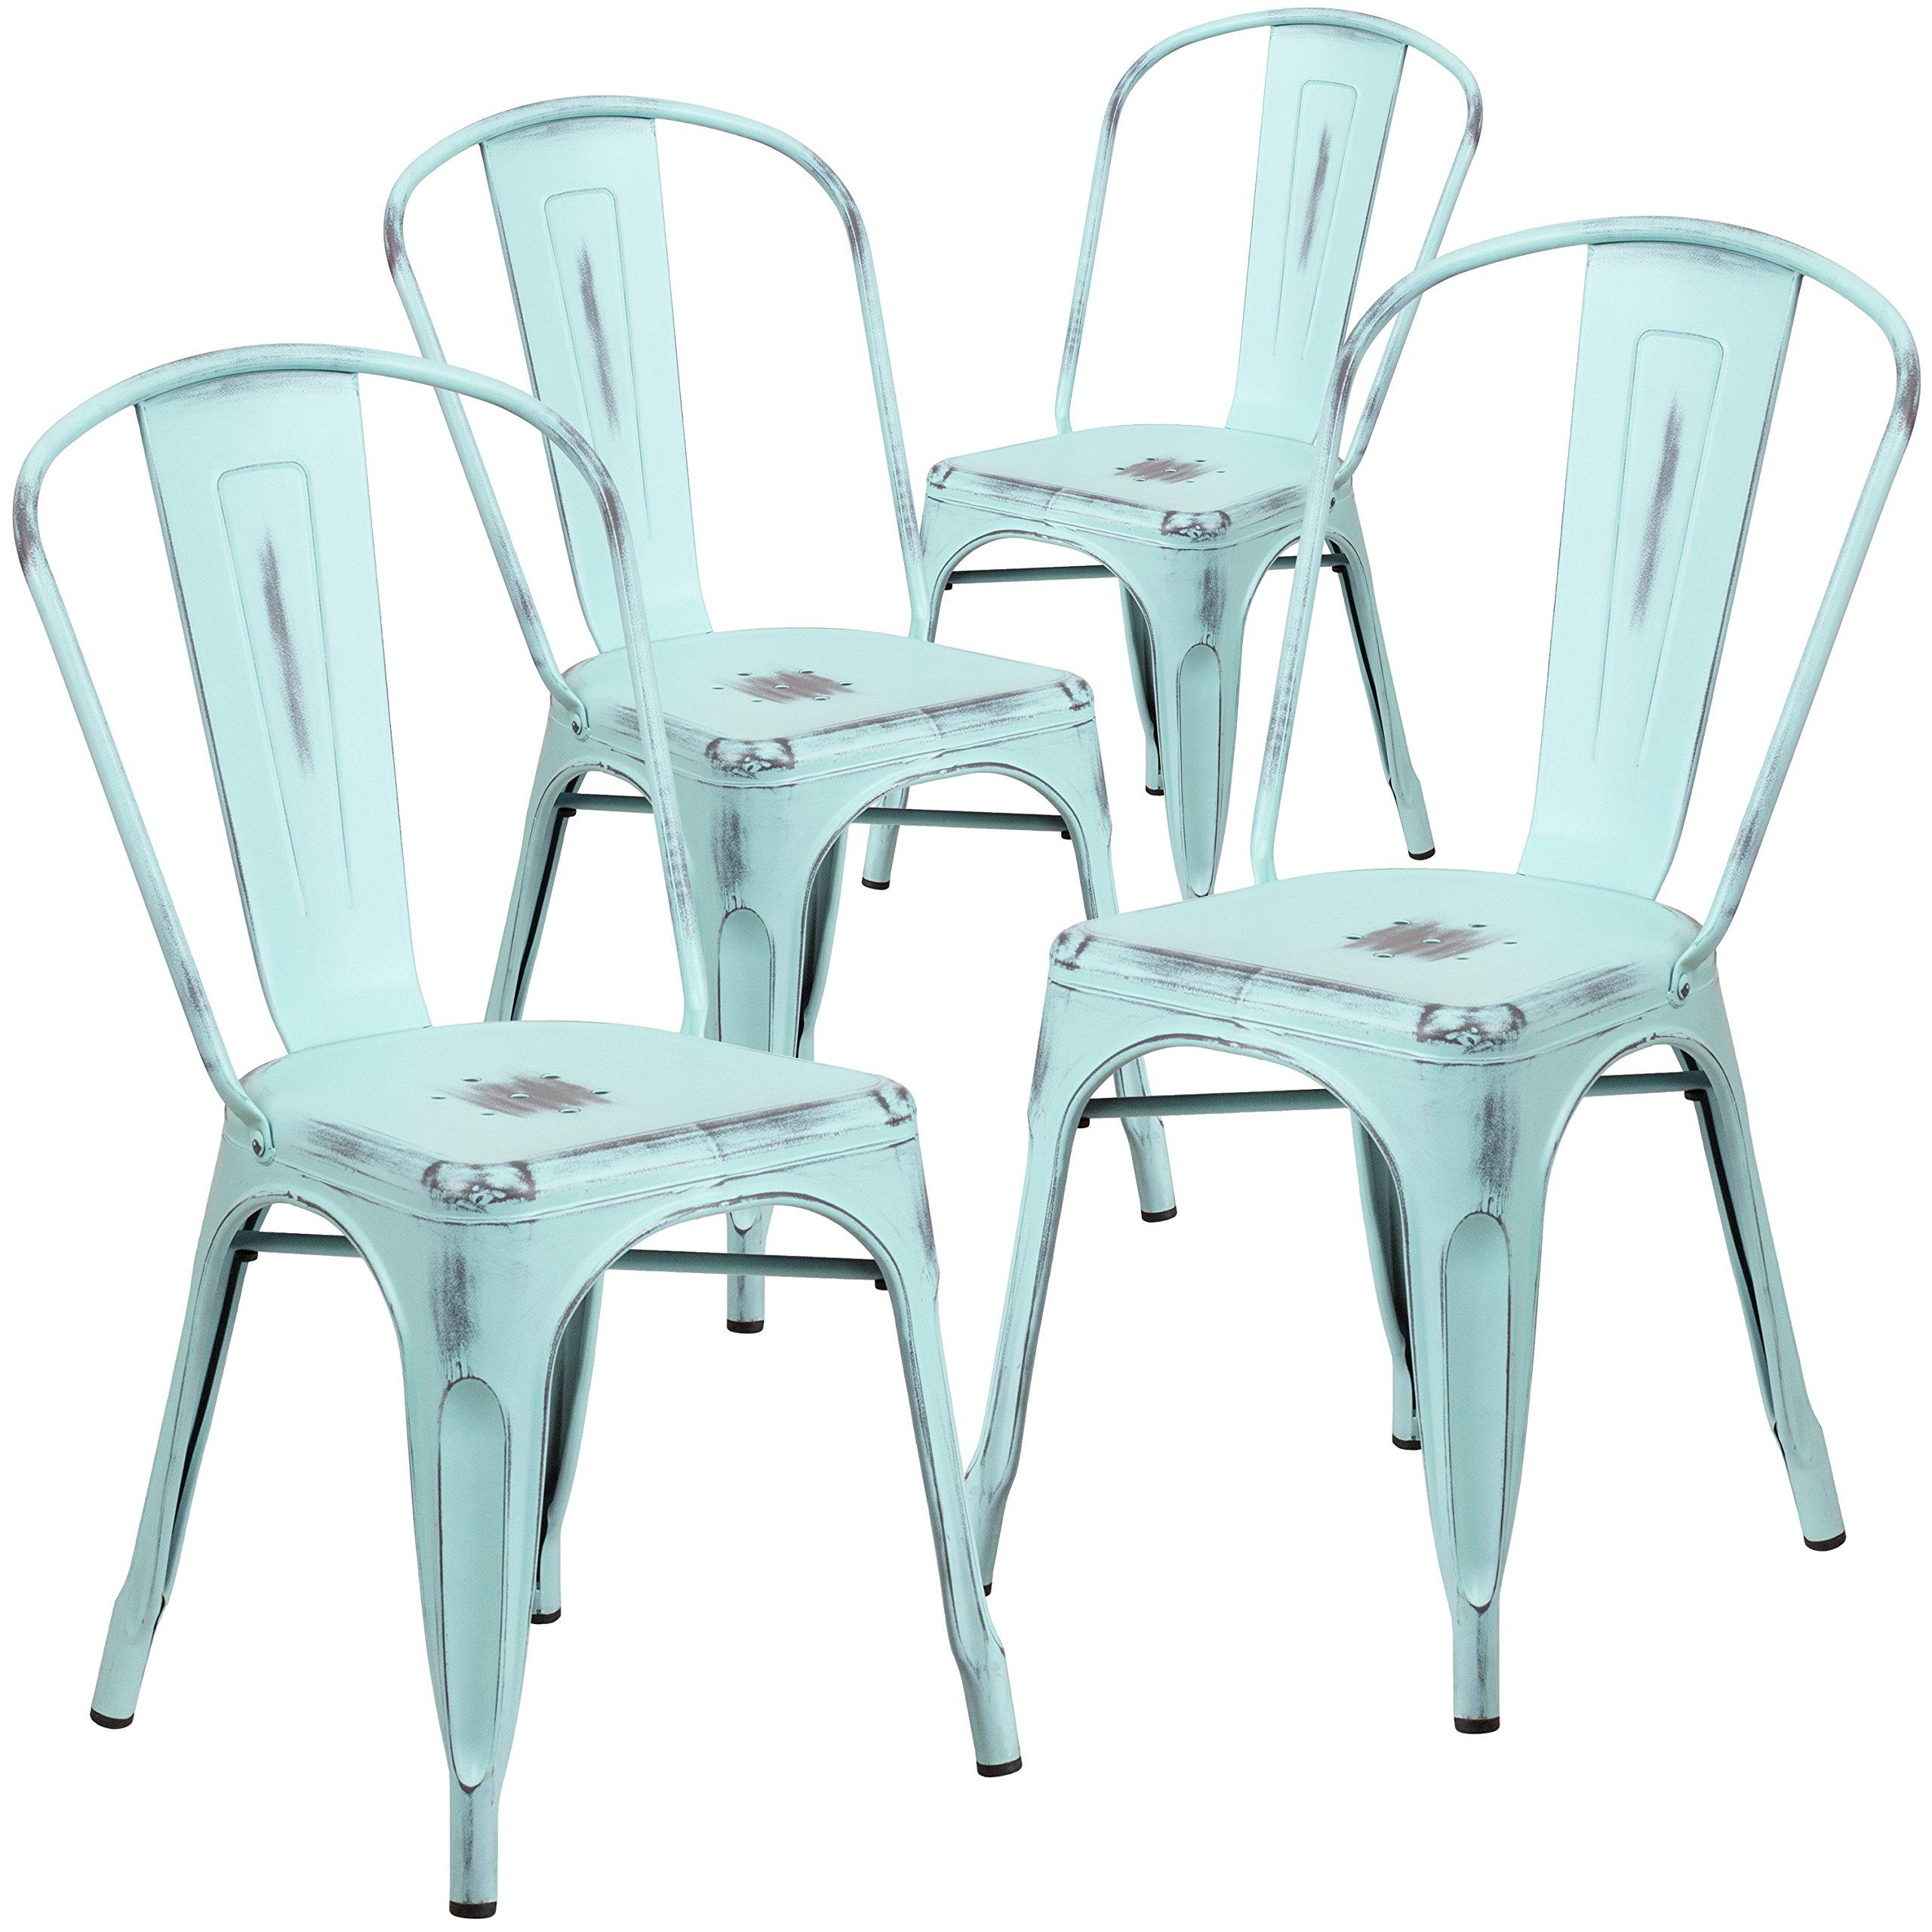 Flash Furniture 4 Pk. Distressed Green-Blue Metal Indoor-Outdoor Stackable Chair